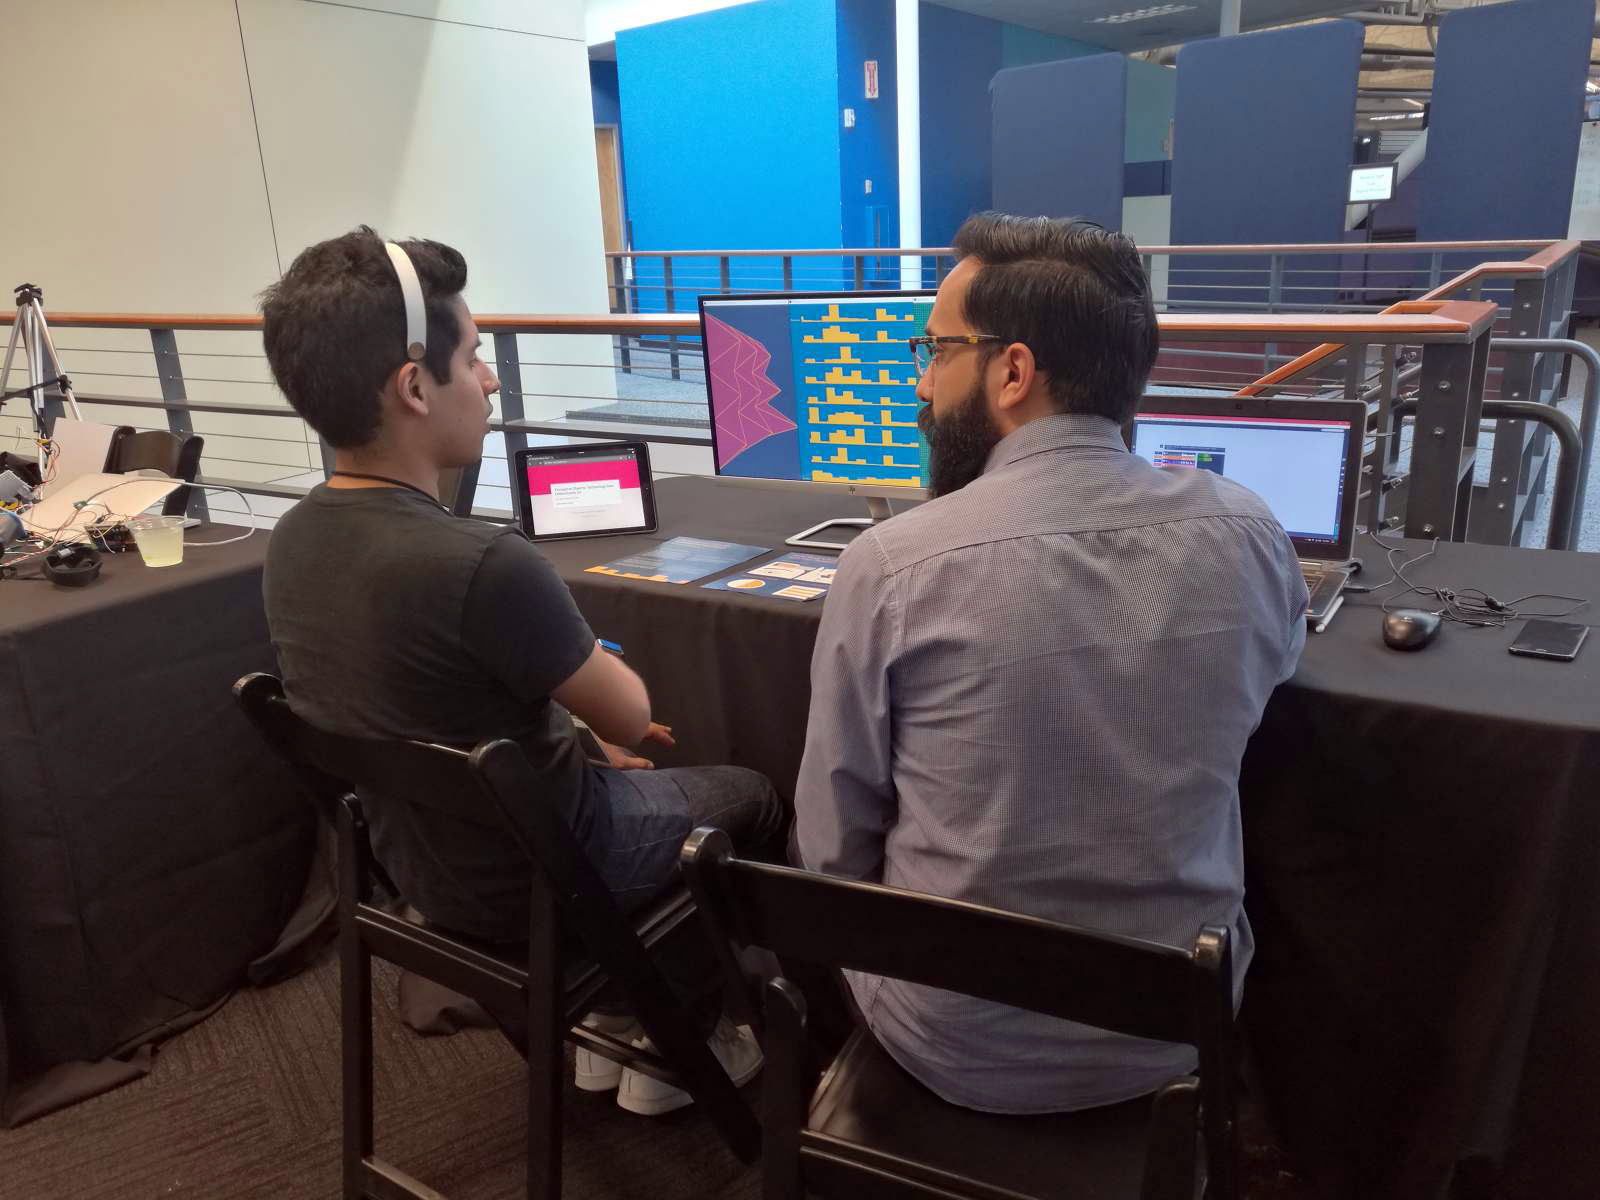 Multi-Sensory Interactions with EEG Data